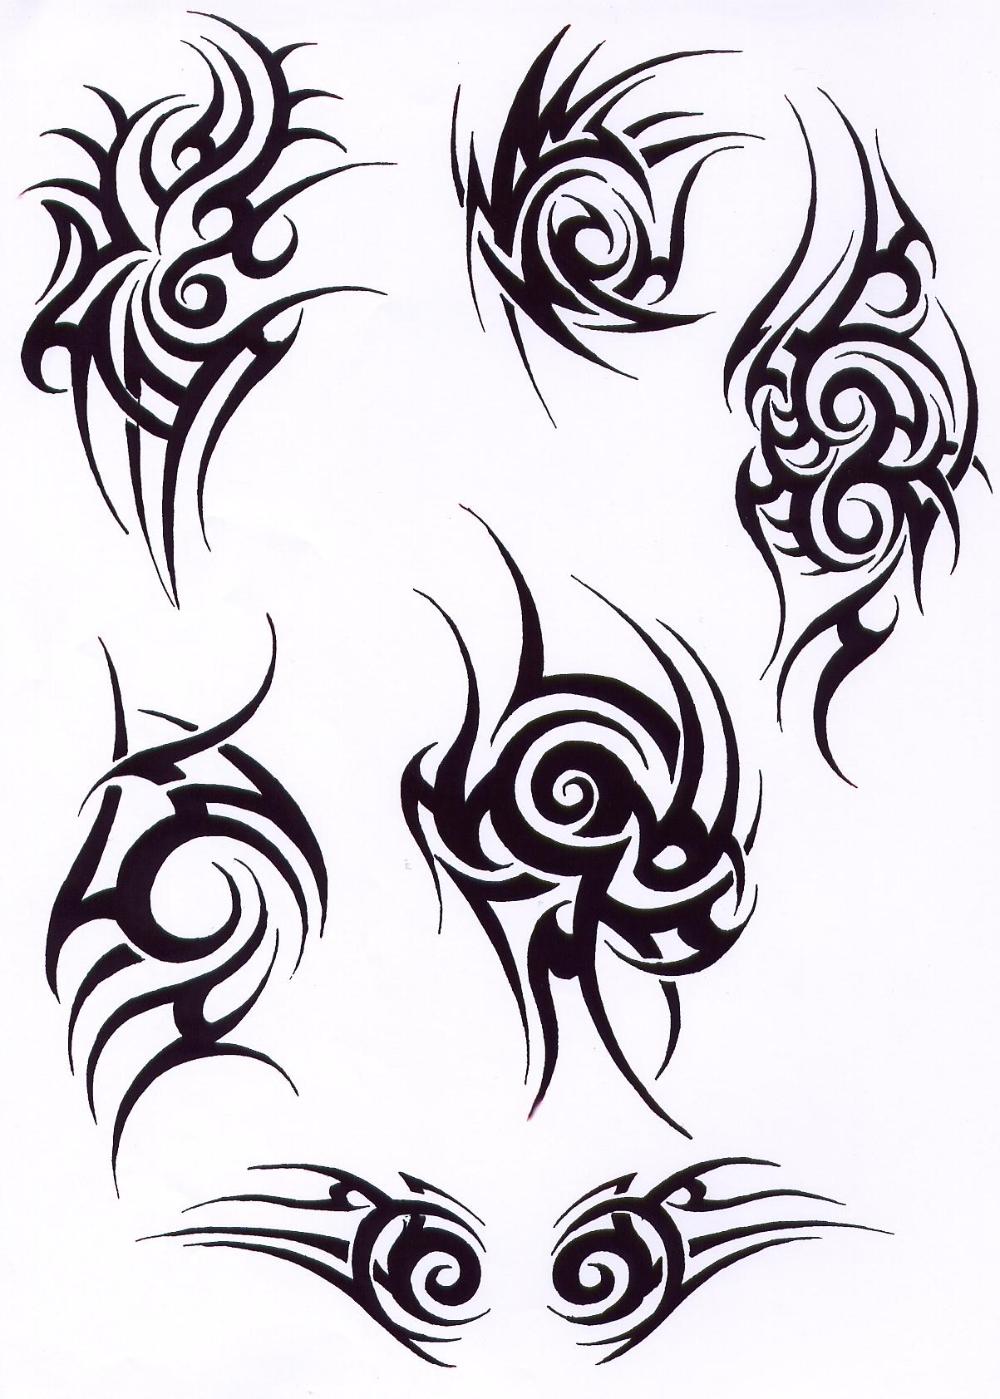 Tribal Hand Tattoo Tribal Hand Tattoos Tribal Arm Tattoos Tribal Tattoos